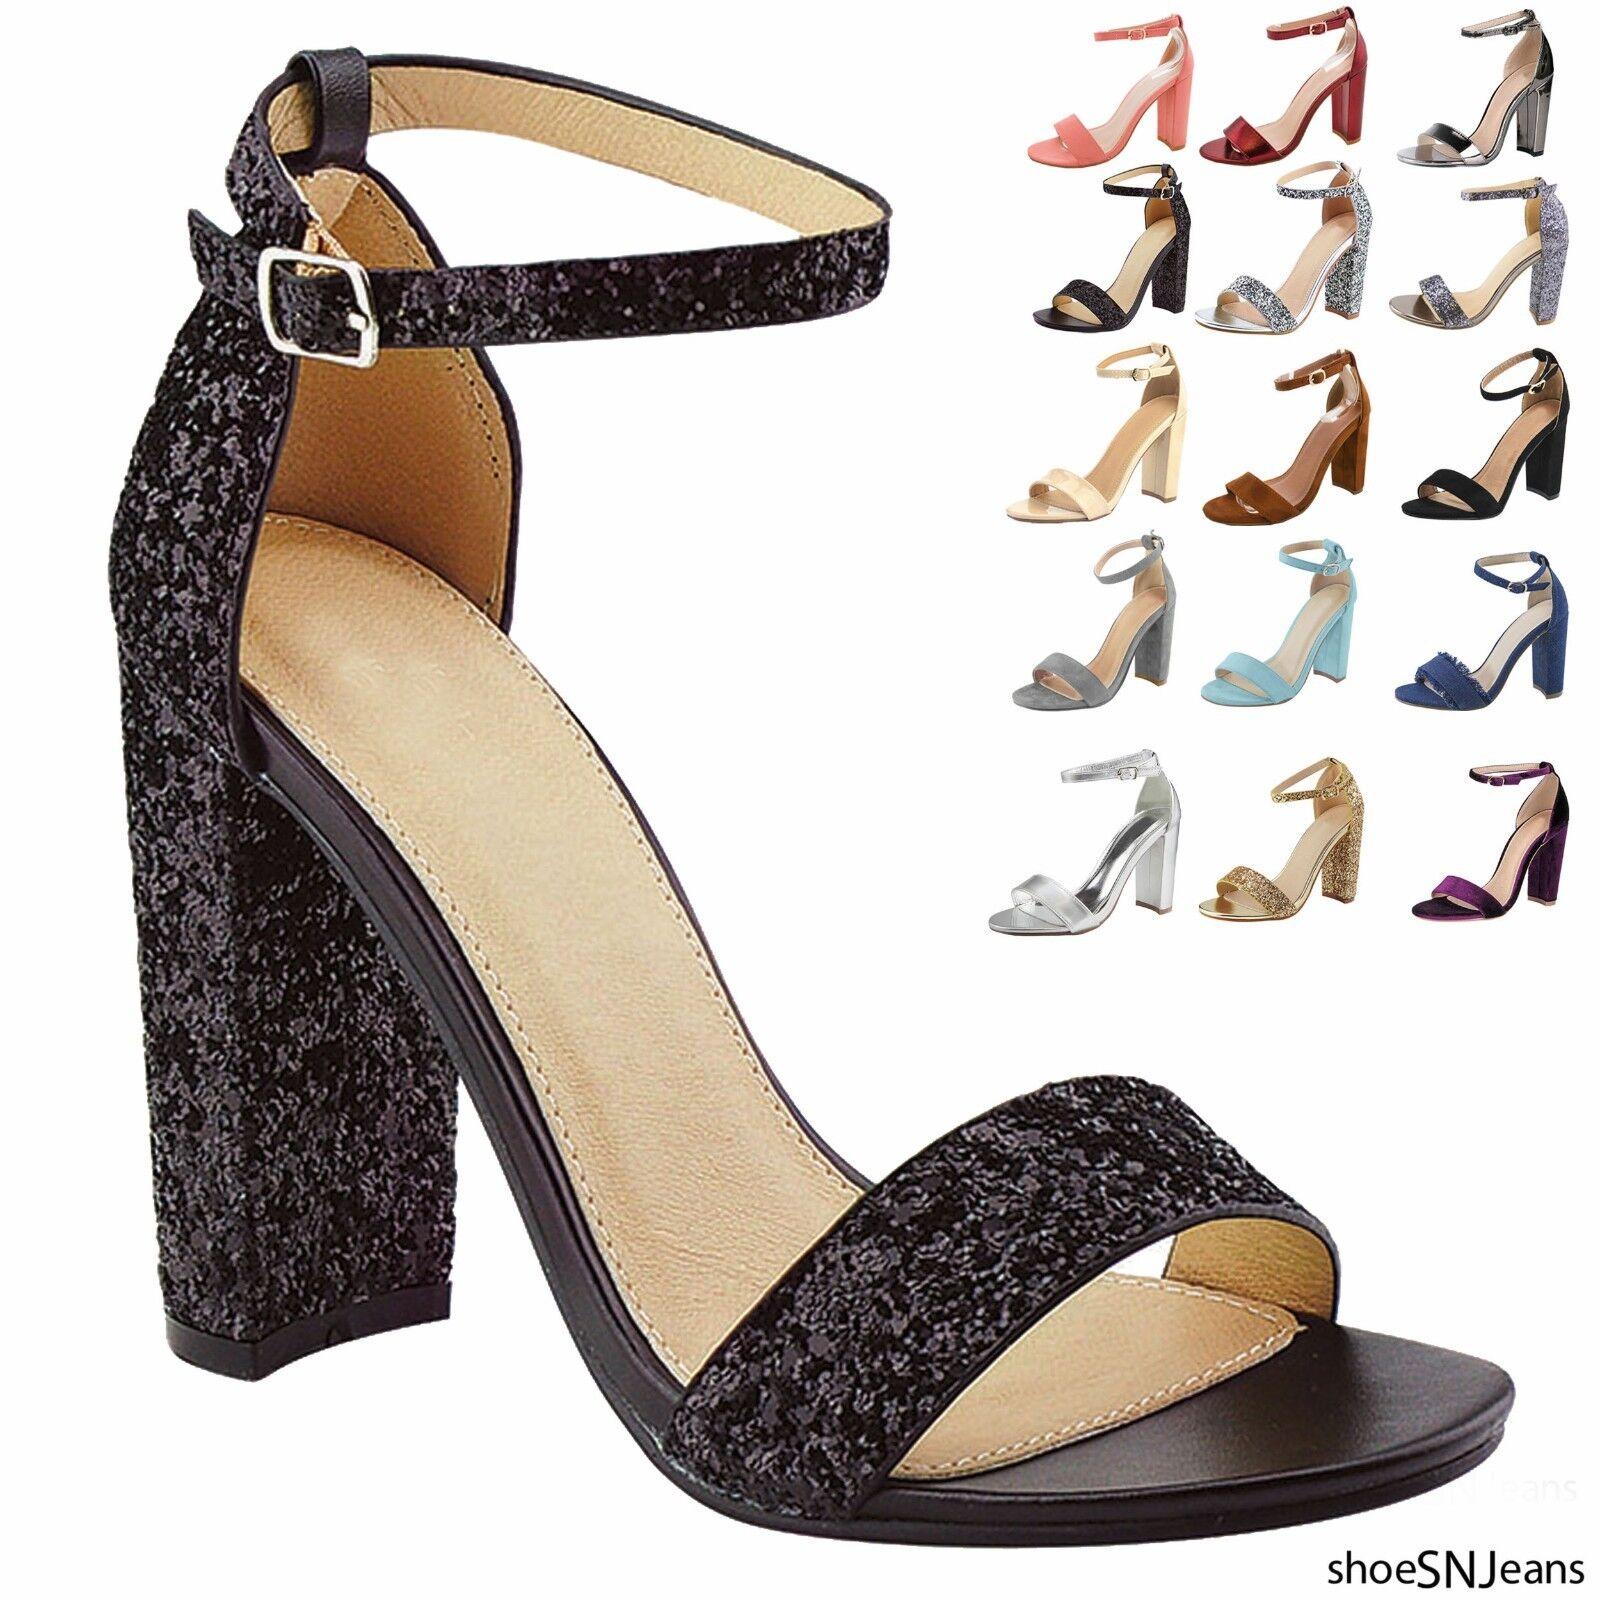 Nuova da Chunky Donna Cinturino Alla Caviglia Chunky da Ballerine Sandali Tacco Alto b76635